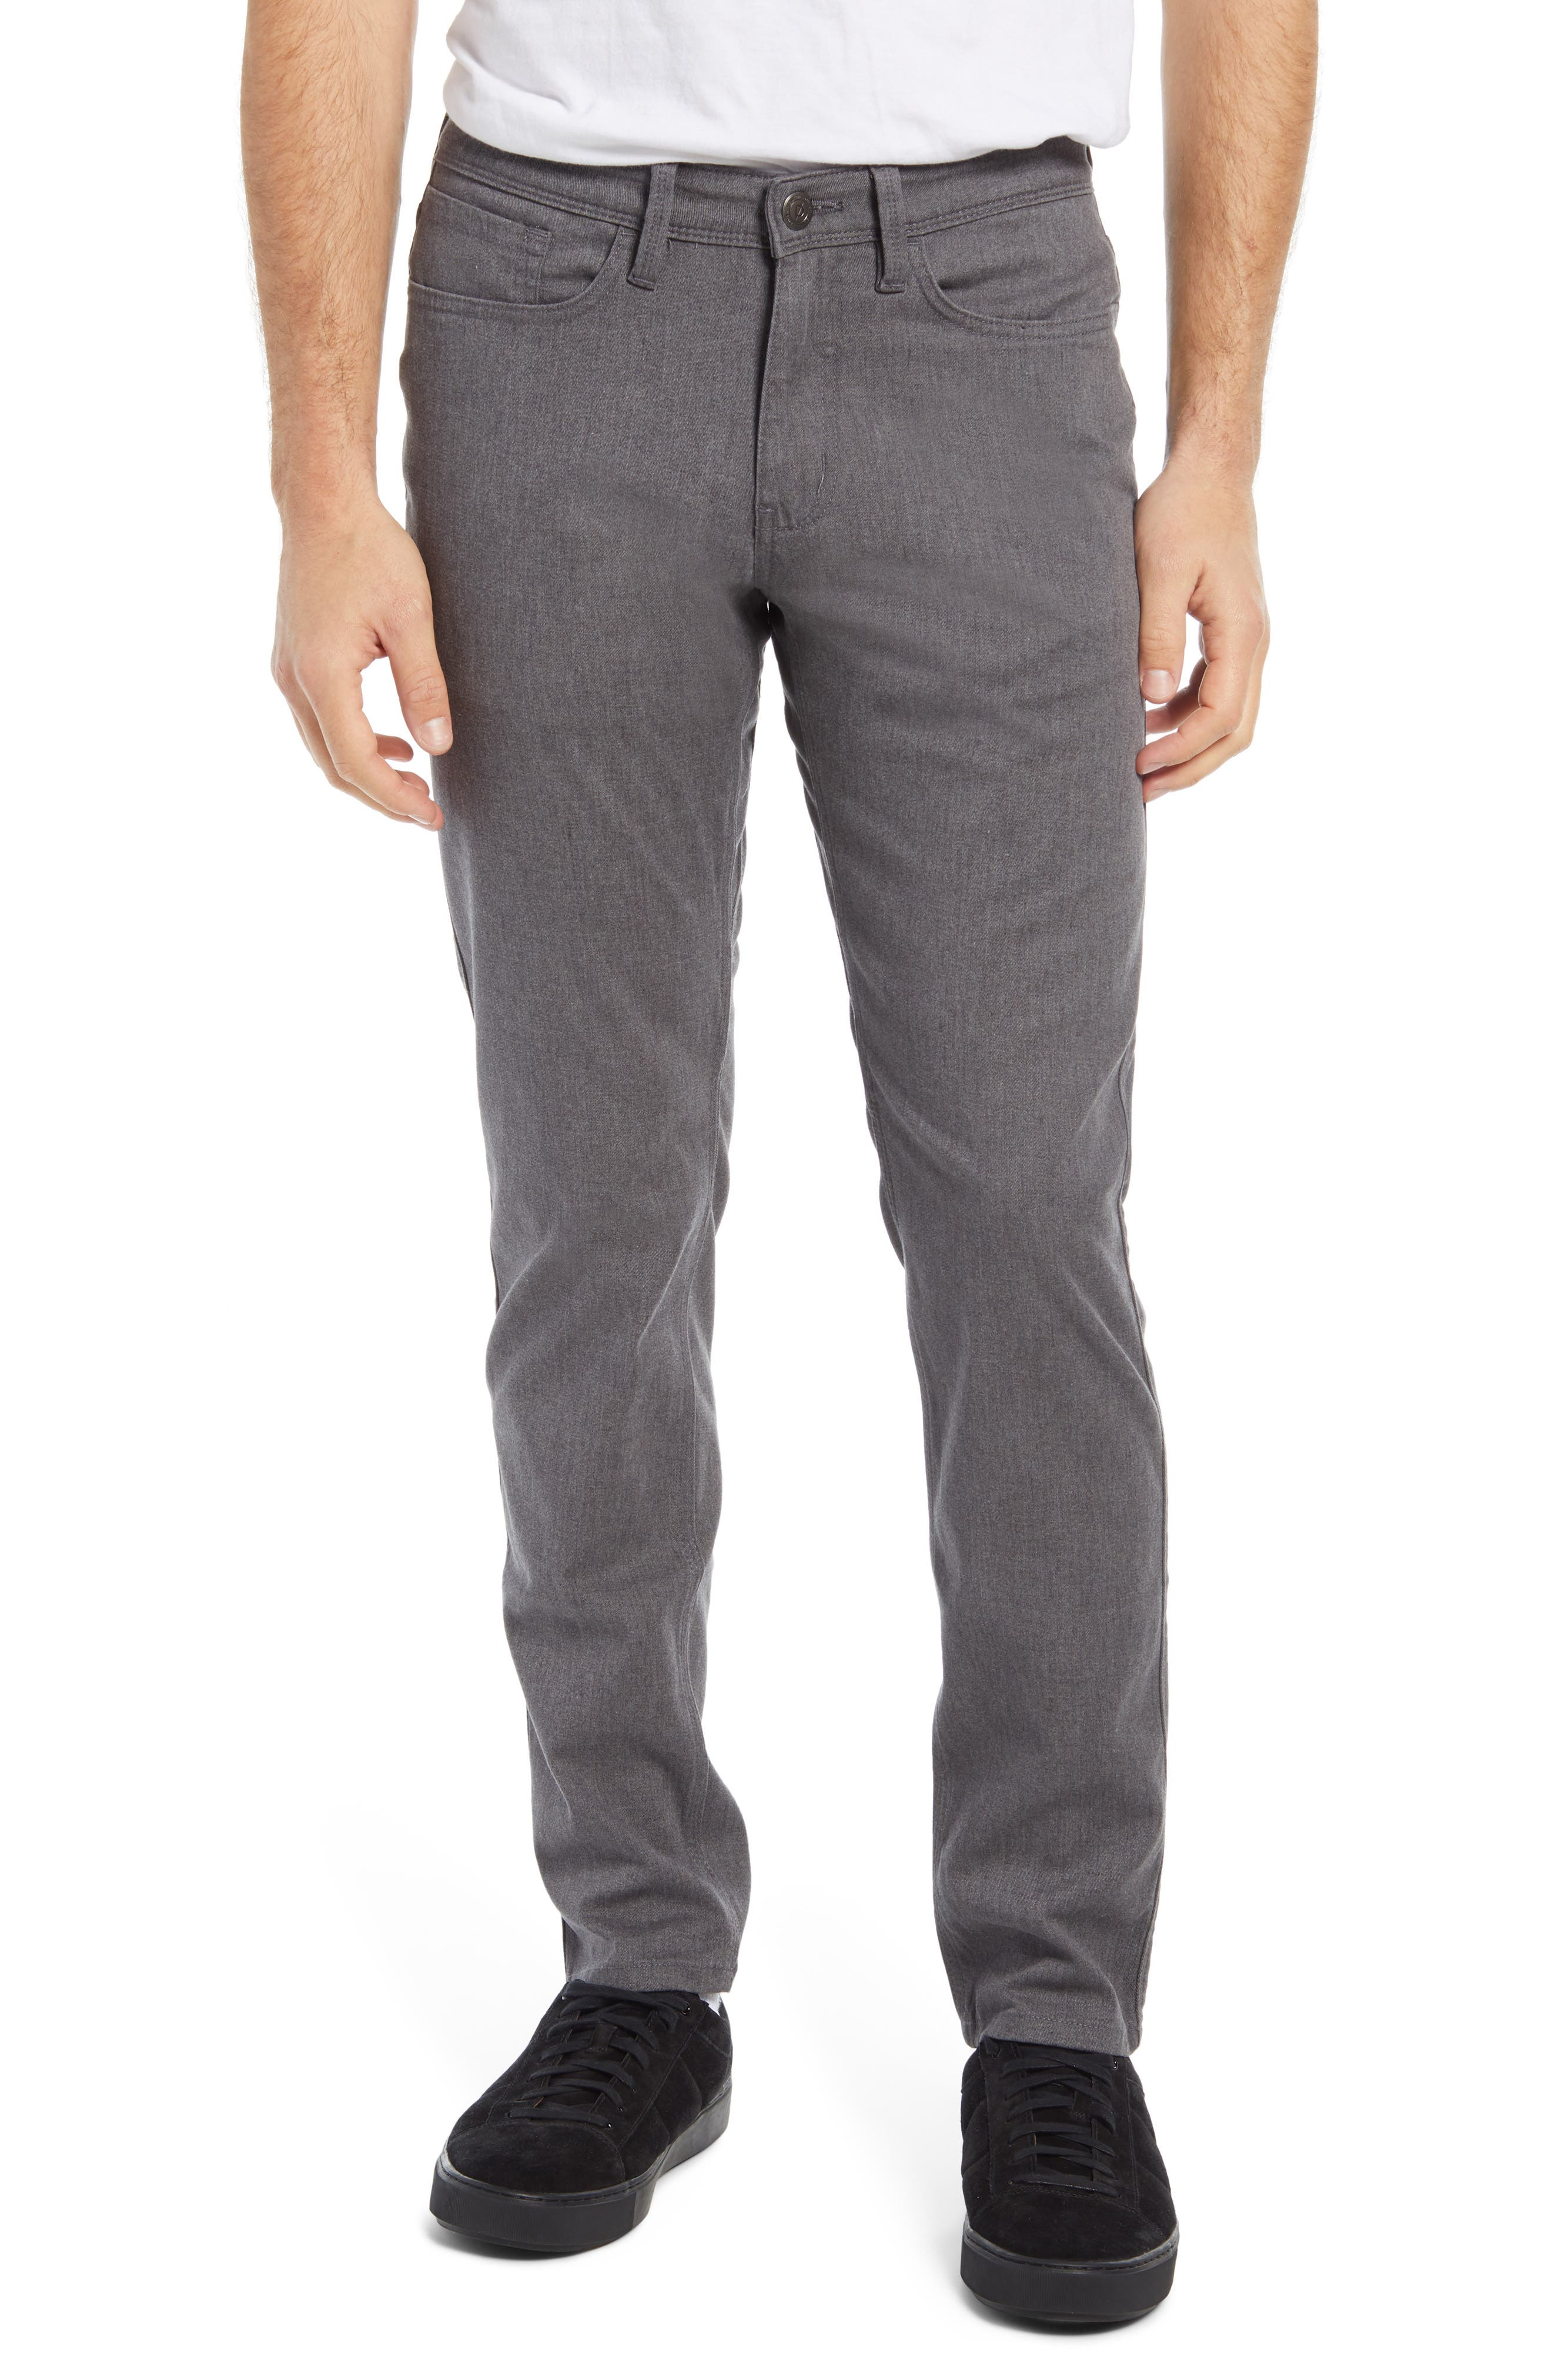 Live Lite Slim Fit Men's Five Pocket Pants